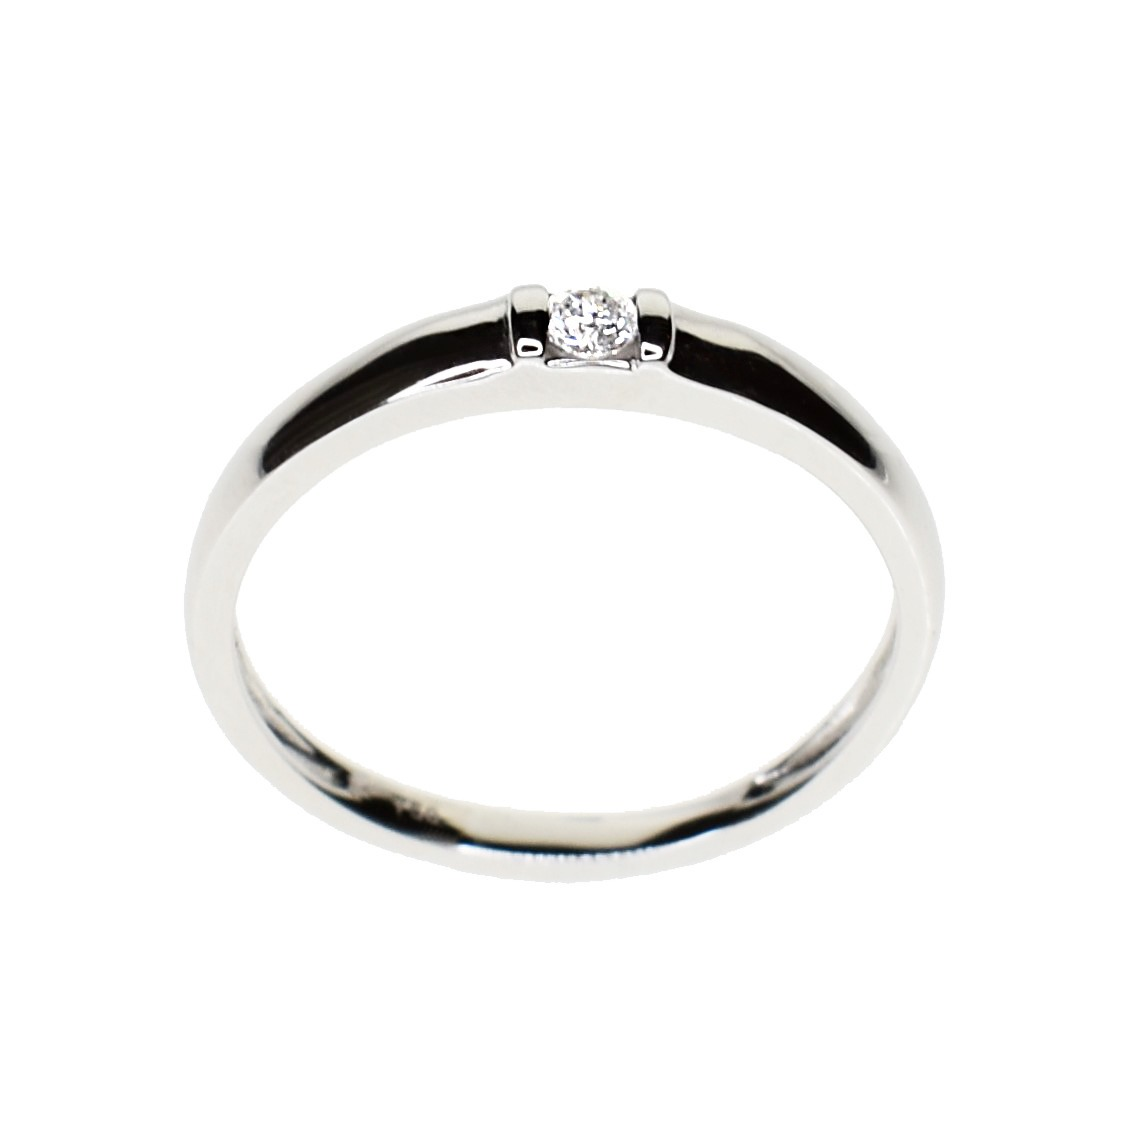 8020b098df05 Anillo Diamante Solitario Compromiso Oro Blanco 18 Kts. -   23.500 ...